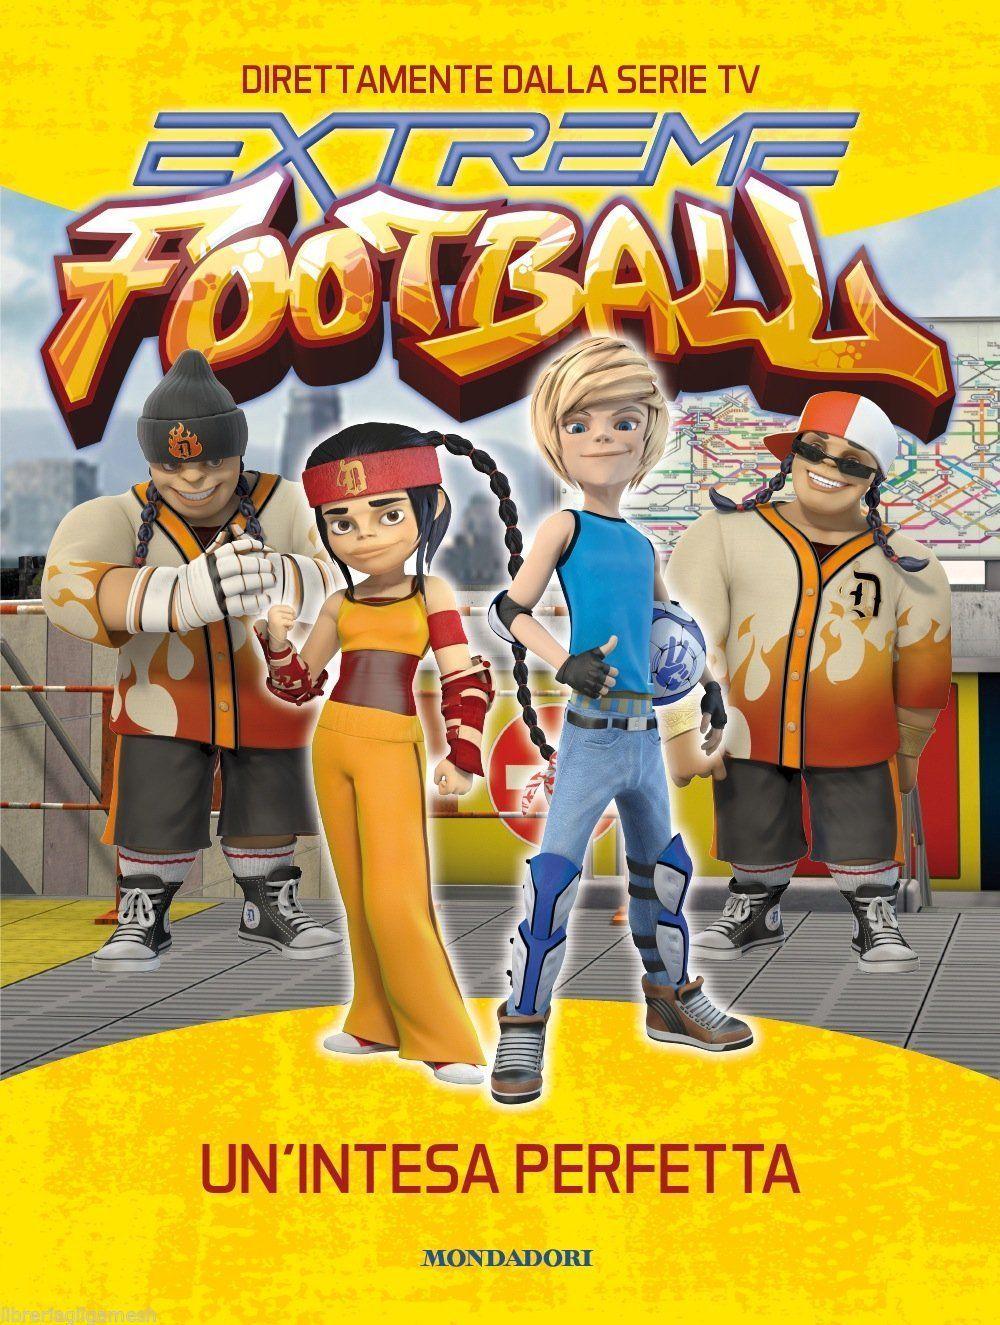 Extreme football unintesa perfetta serie tv libro calcio ragazzi 10